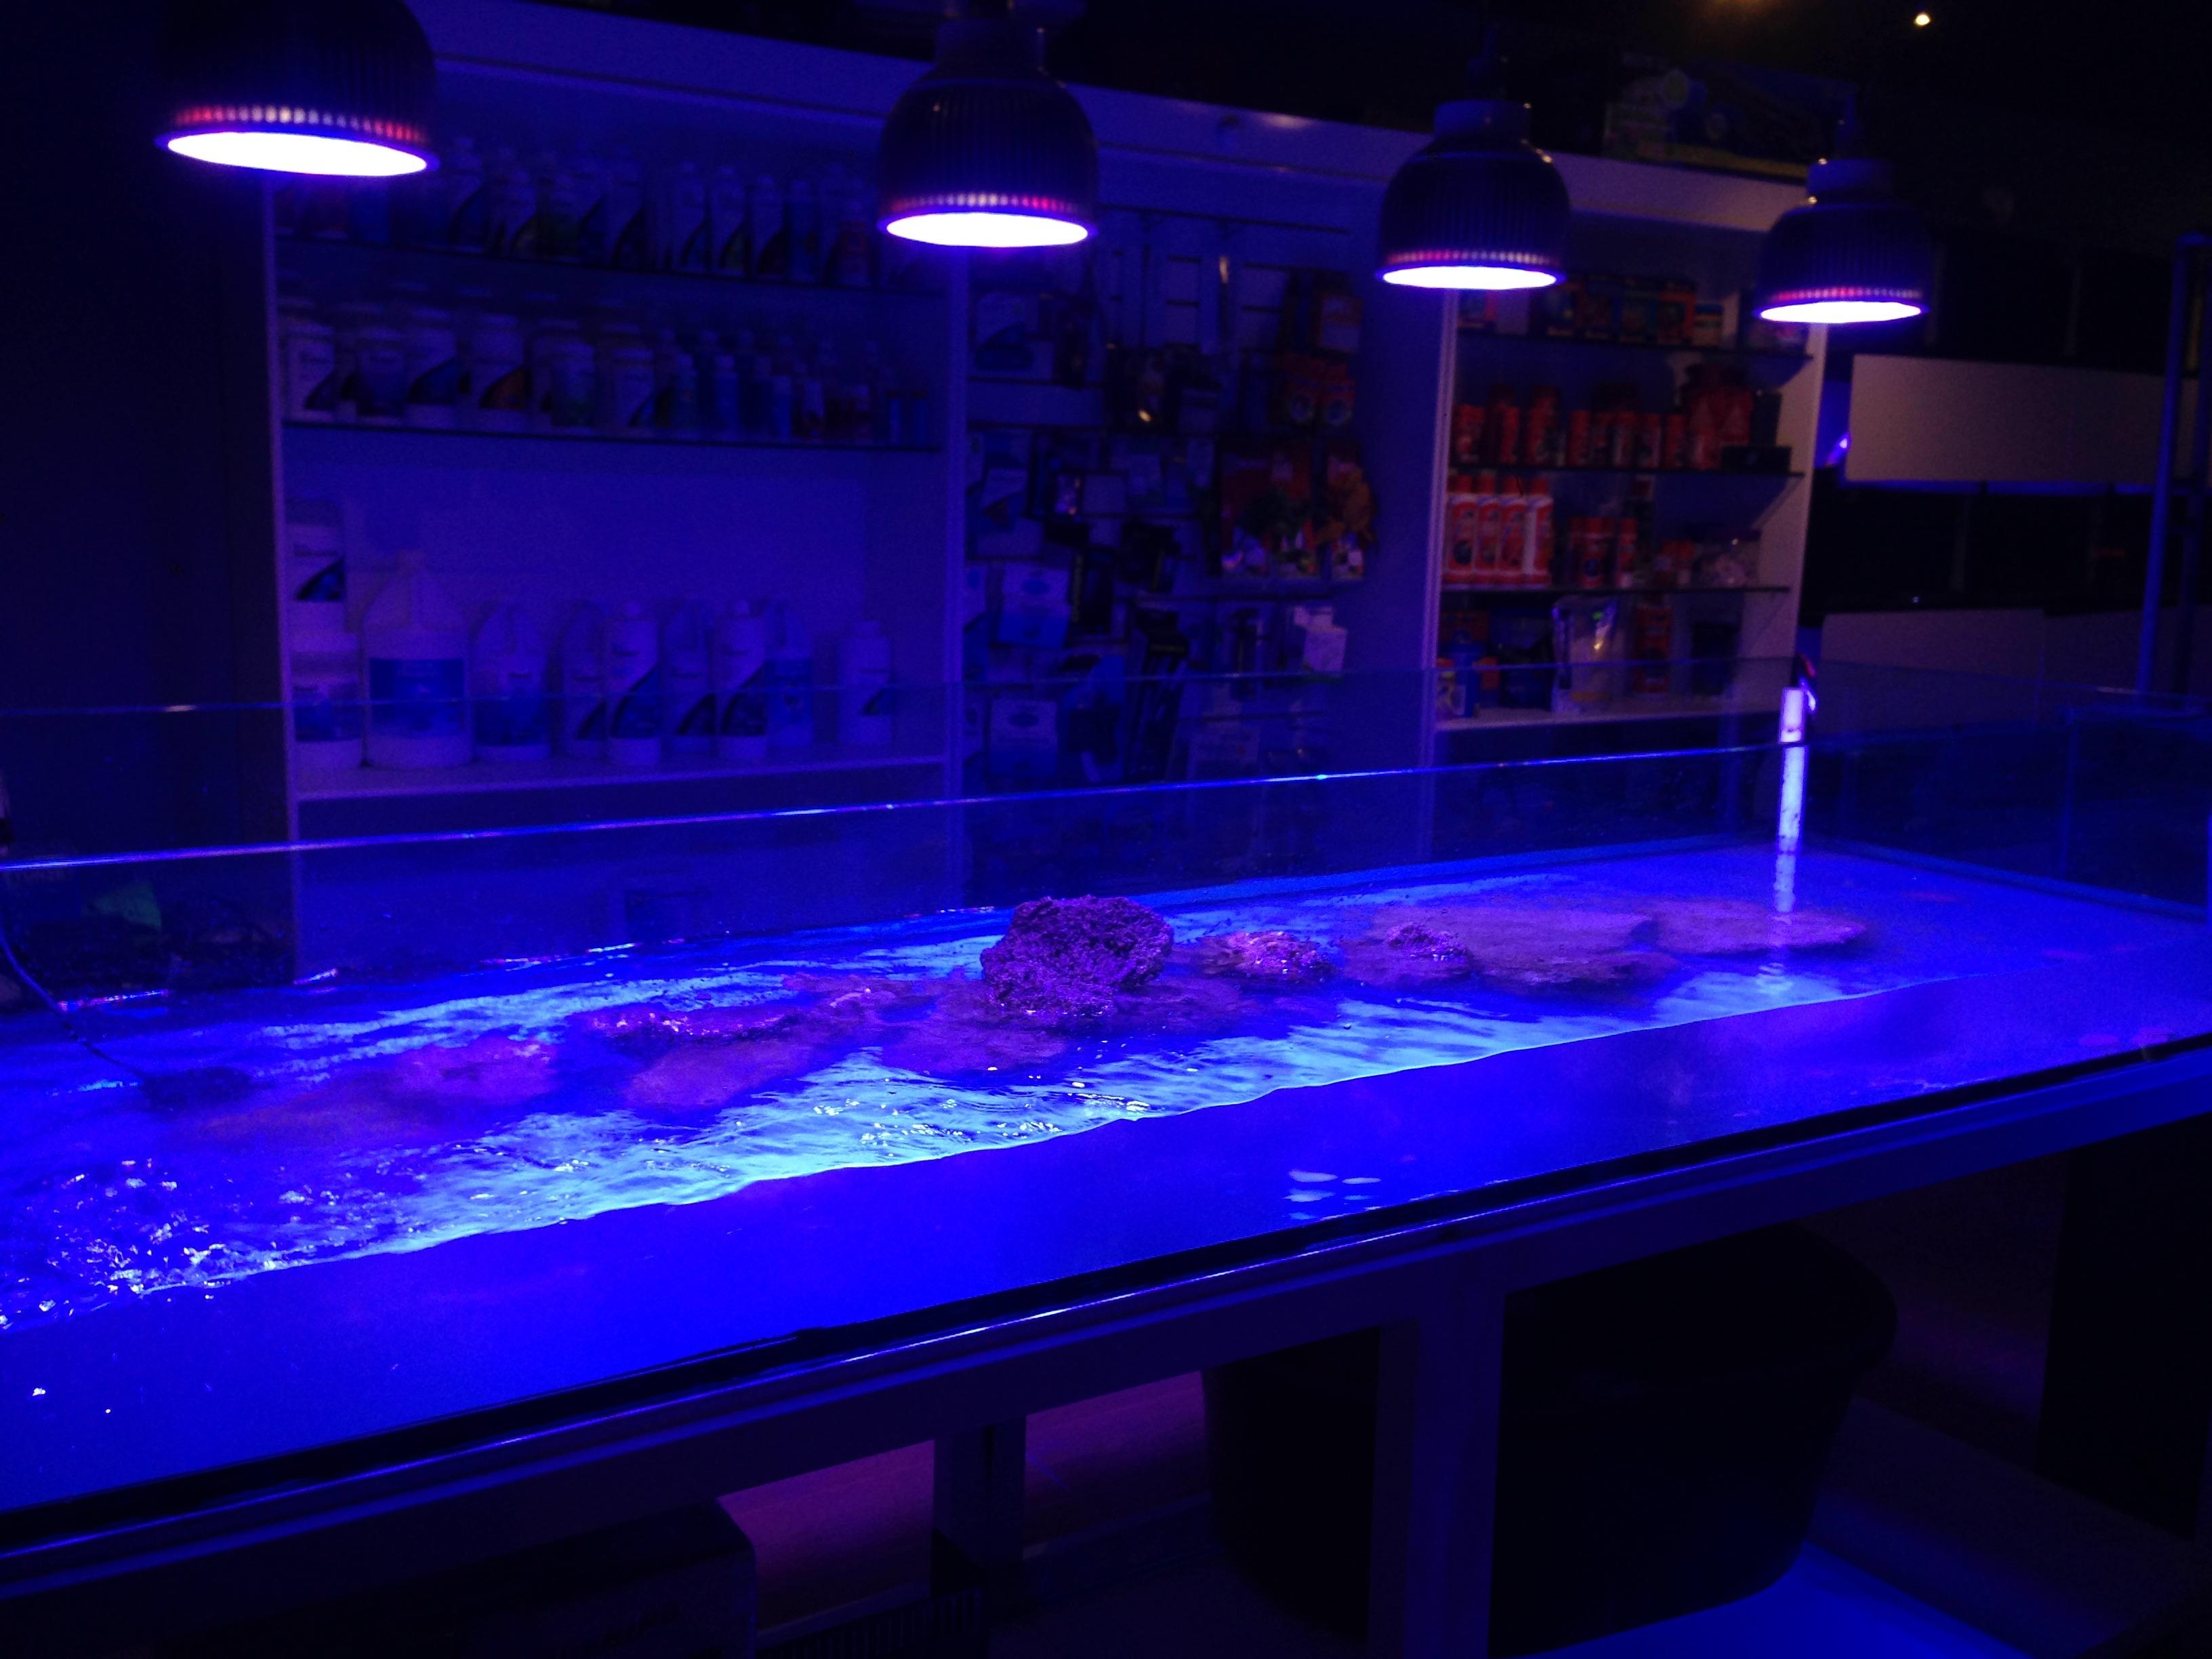 orphek led beleuchtung jetzt in mexiko erh ltlich aquarium led beleuchtung orphek. Black Bedroom Furniture Sets. Home Design Ideas